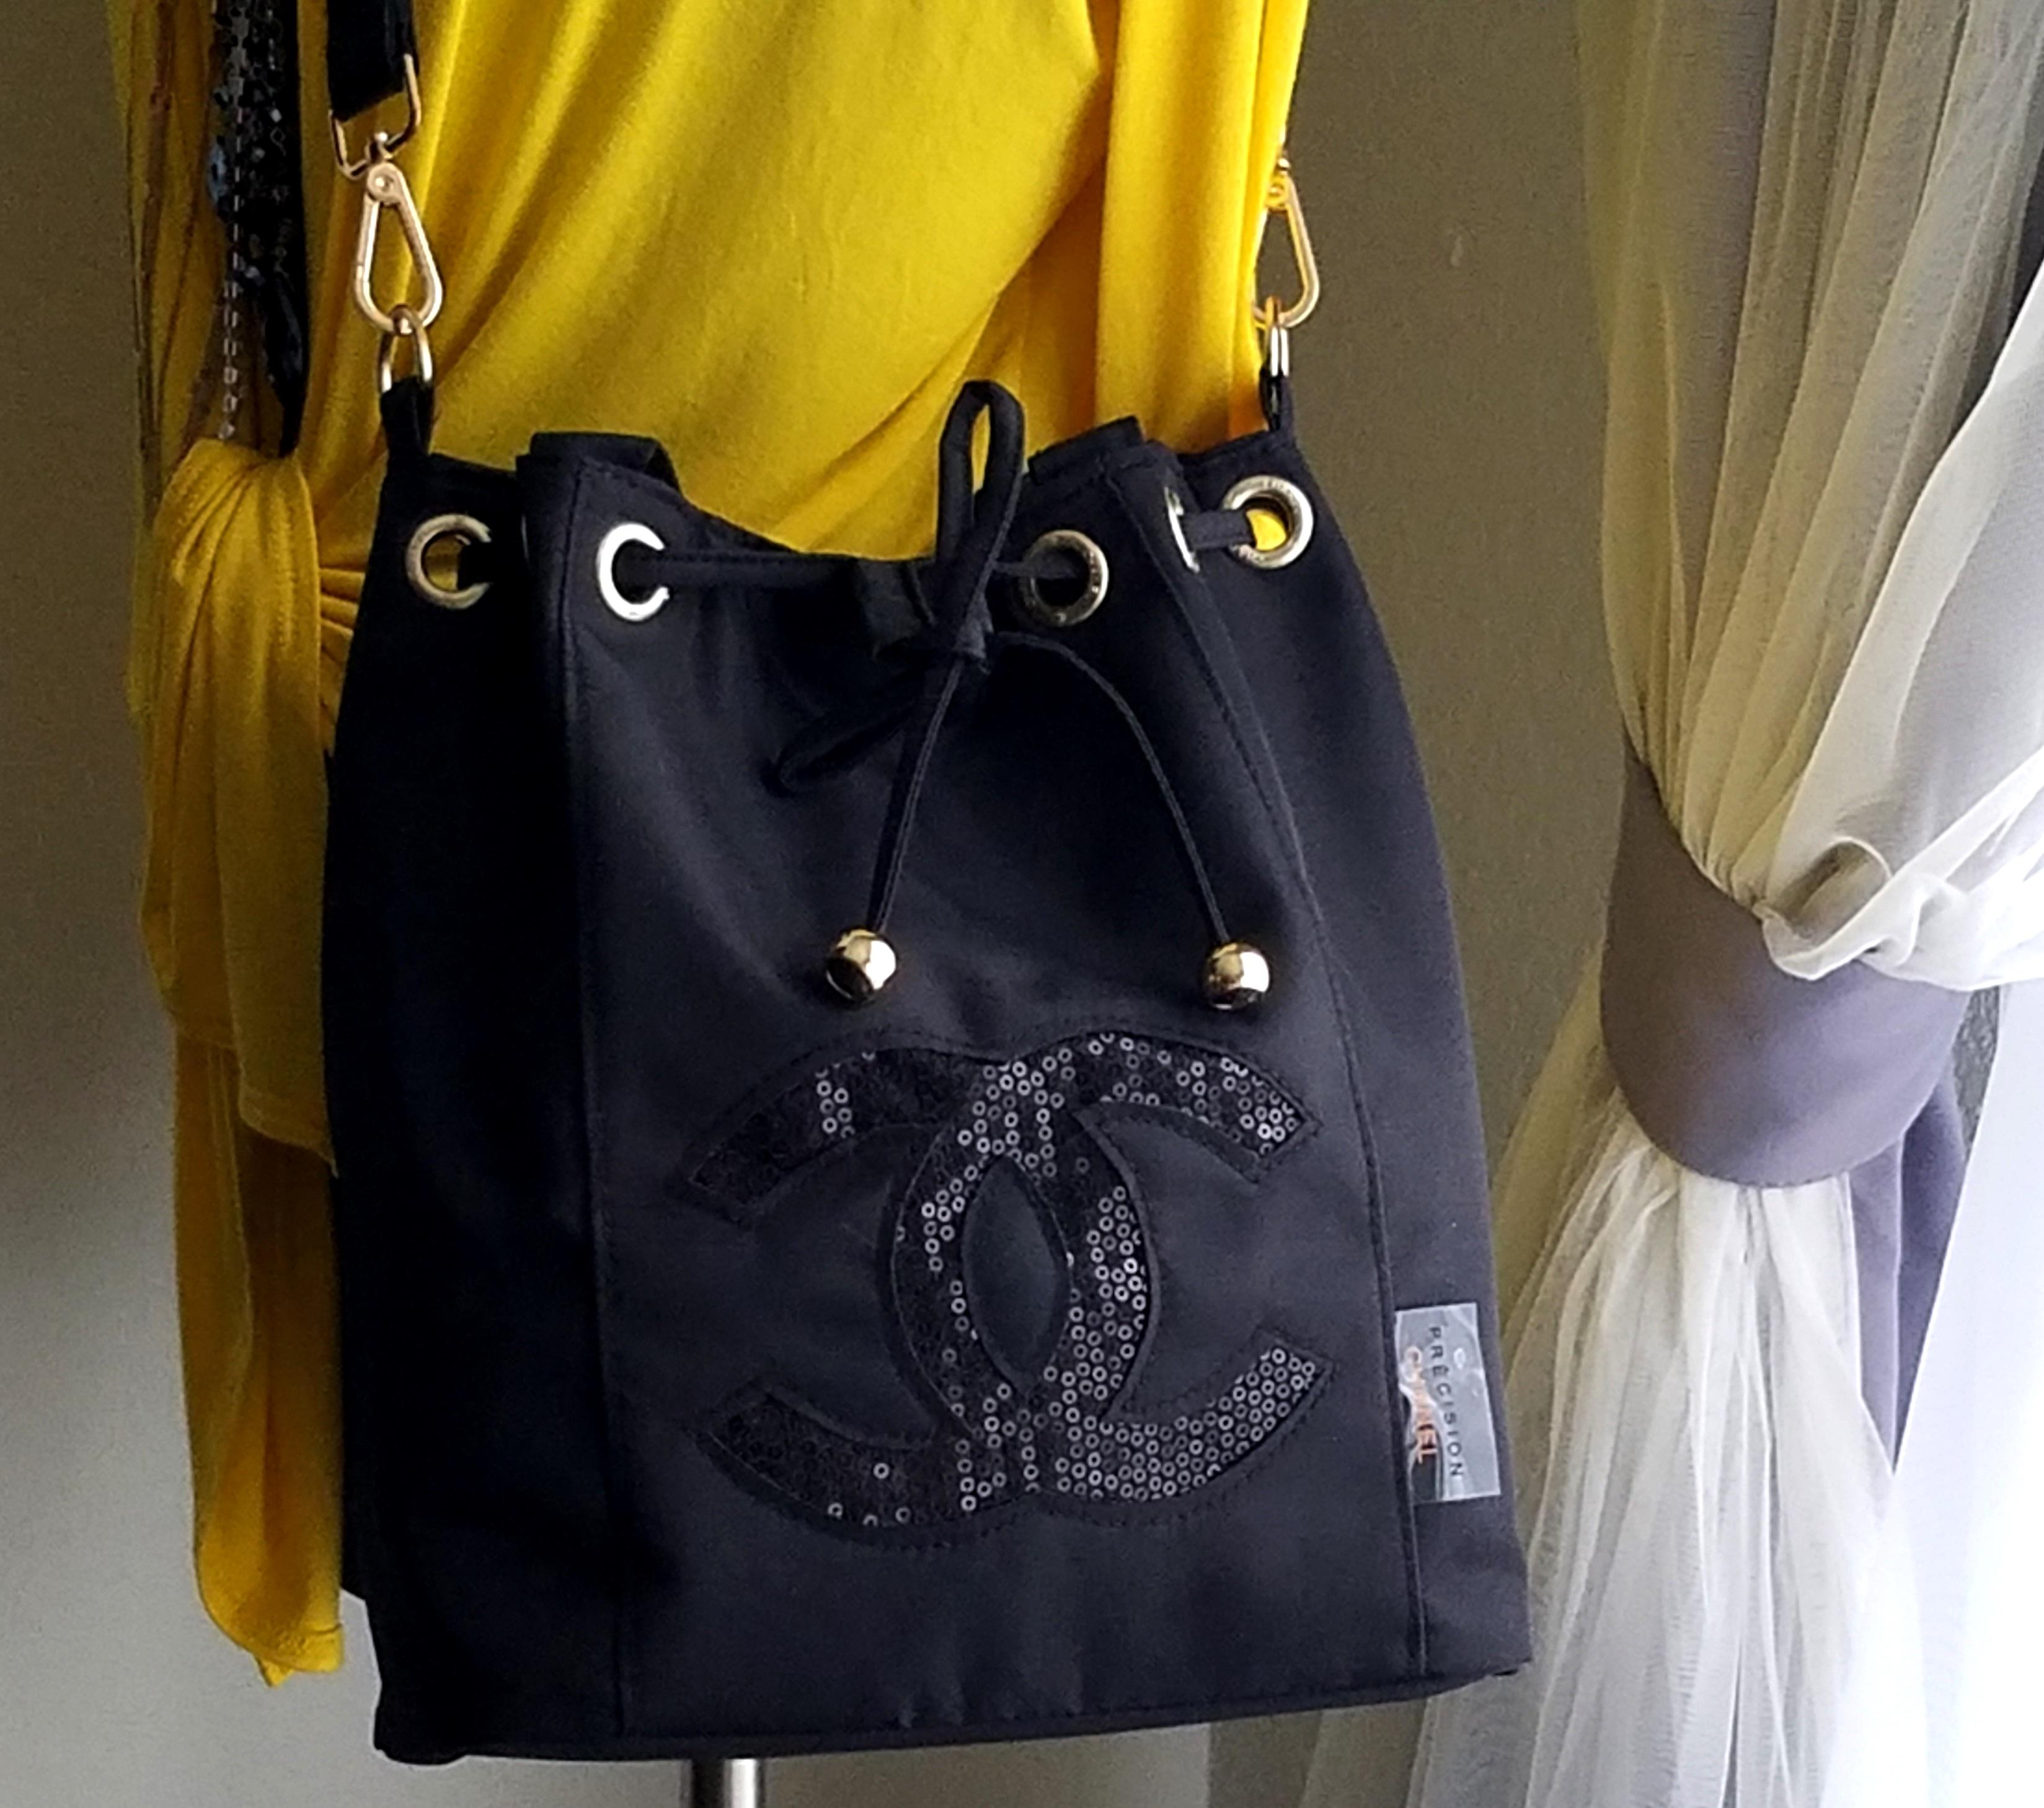 20bc40a797b8 NEW Chanel Vip Gift Black Drawstring Bucket Shoulder Bag on Storenvy